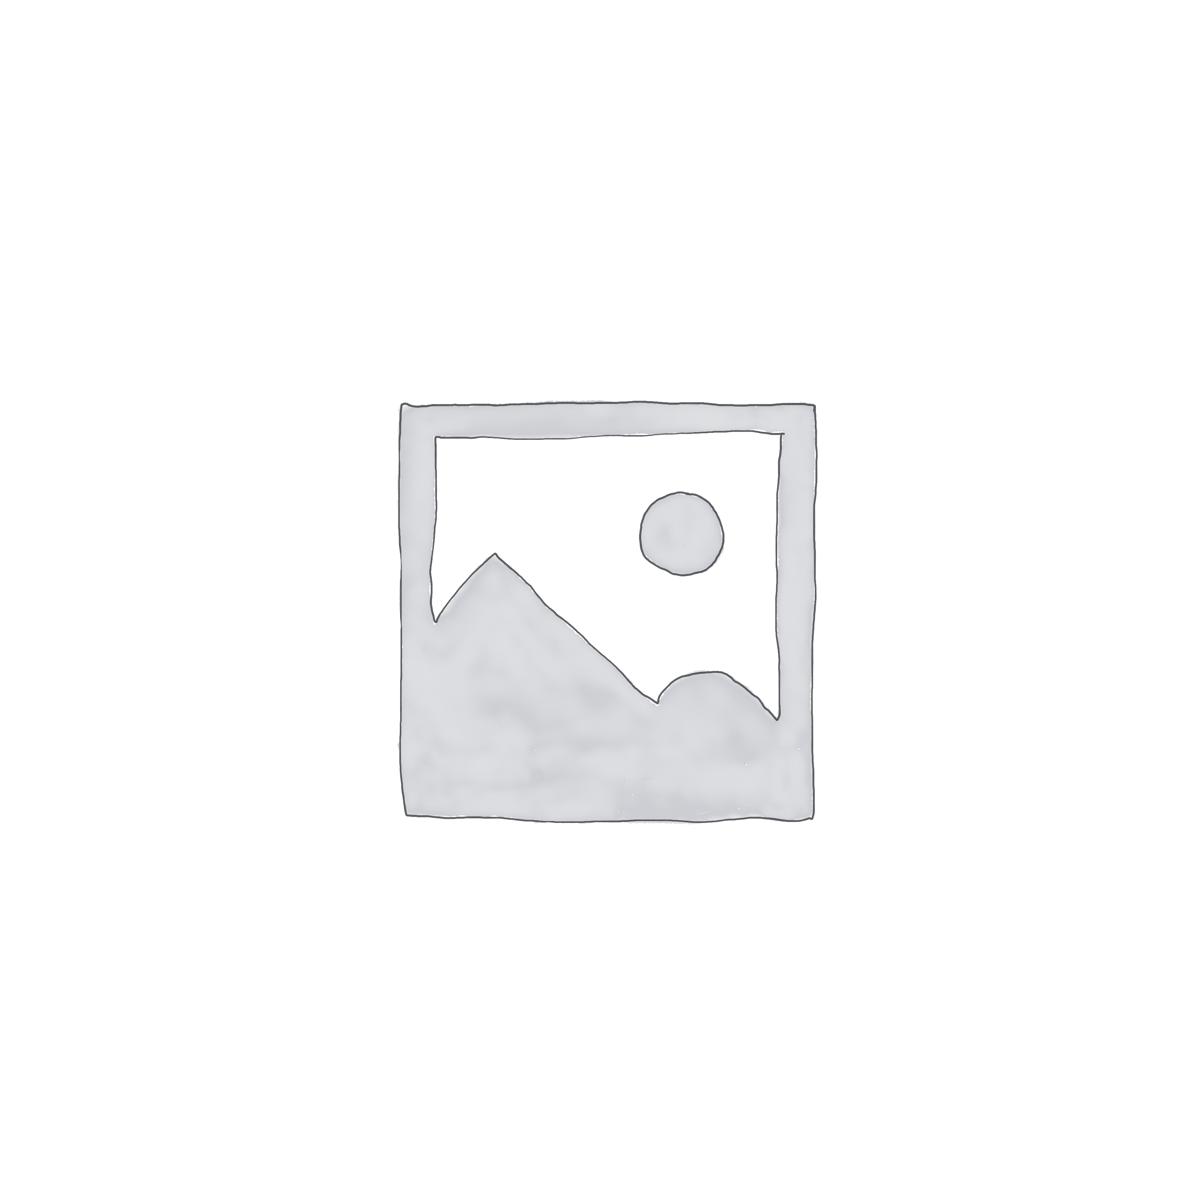 Sea View with Garden Flowers Wallpaper Mural